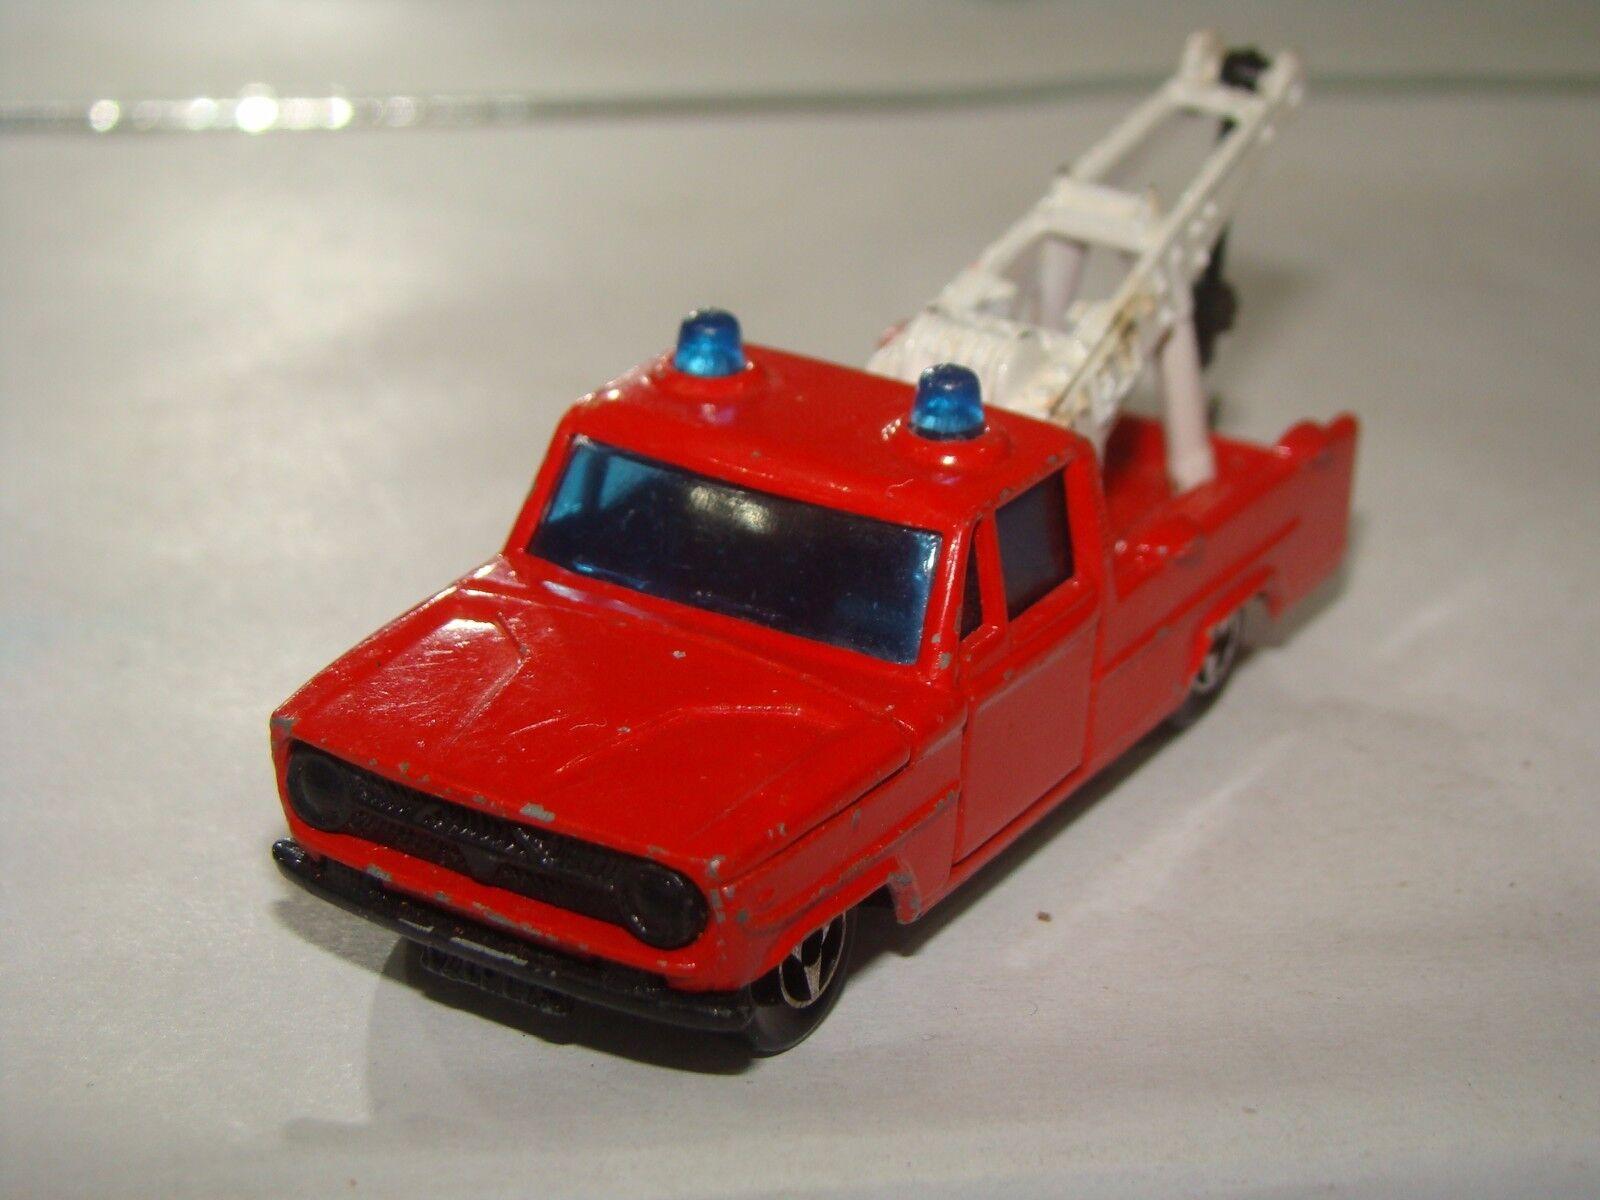 el estilo clásico Imbrima inbrima inbrima inbrima Majorette camioneta B062  comprar barato